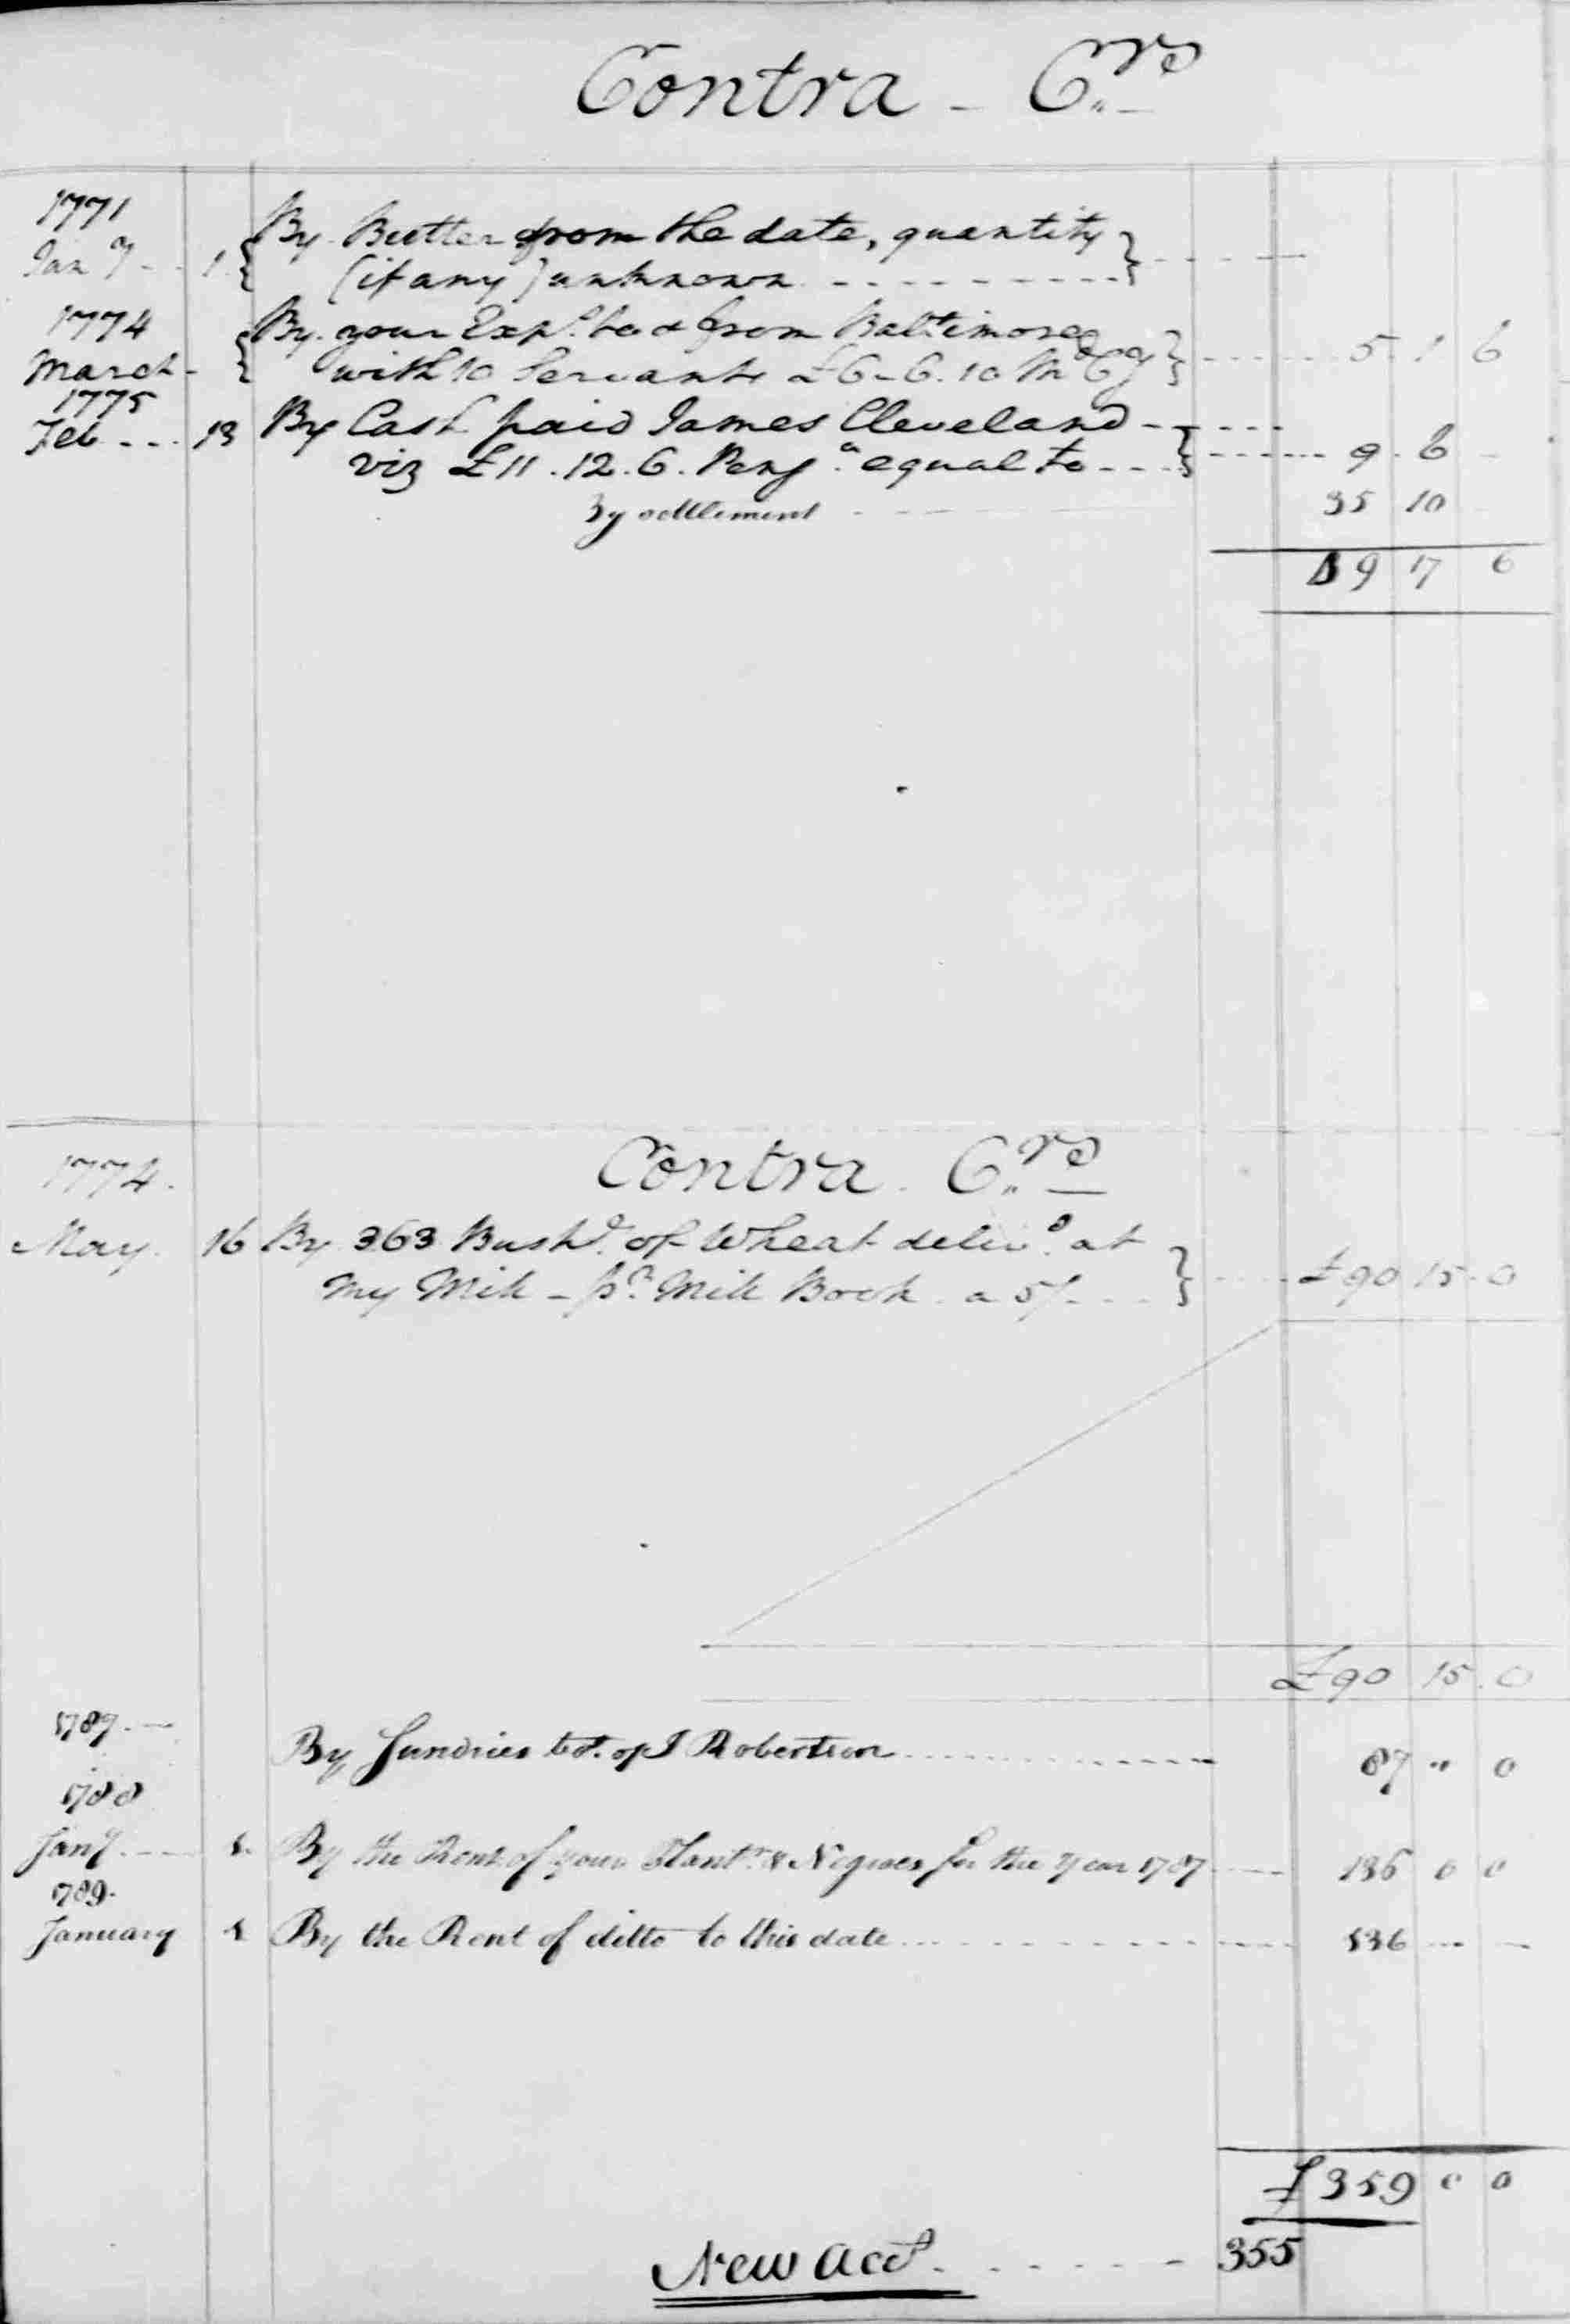 Ledger B, folio 27, right side